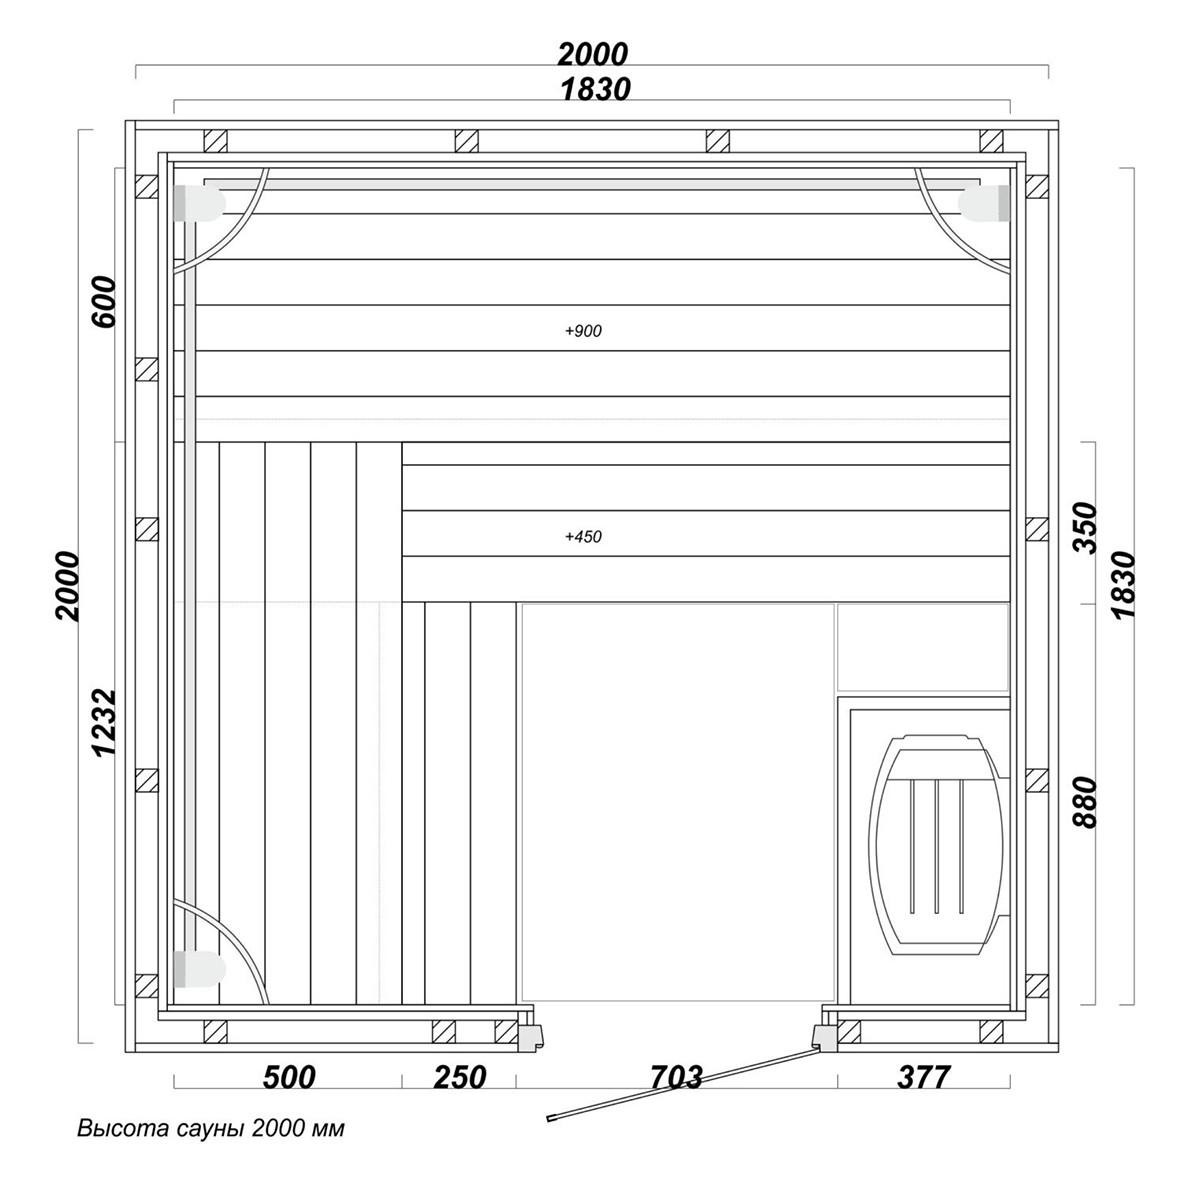 sauna5 - Проект сауны 2 Х 2 М